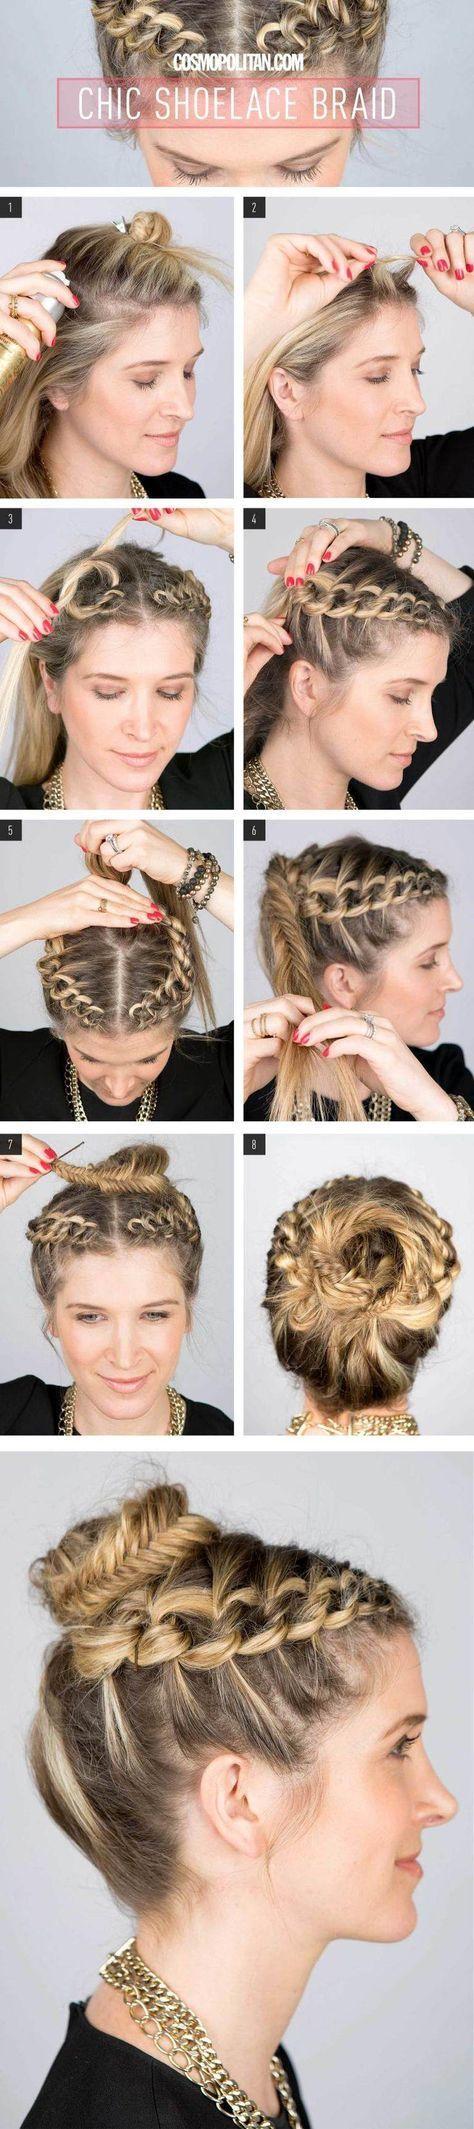 Super easy diy braided hairstyles for wedding tutorials crown